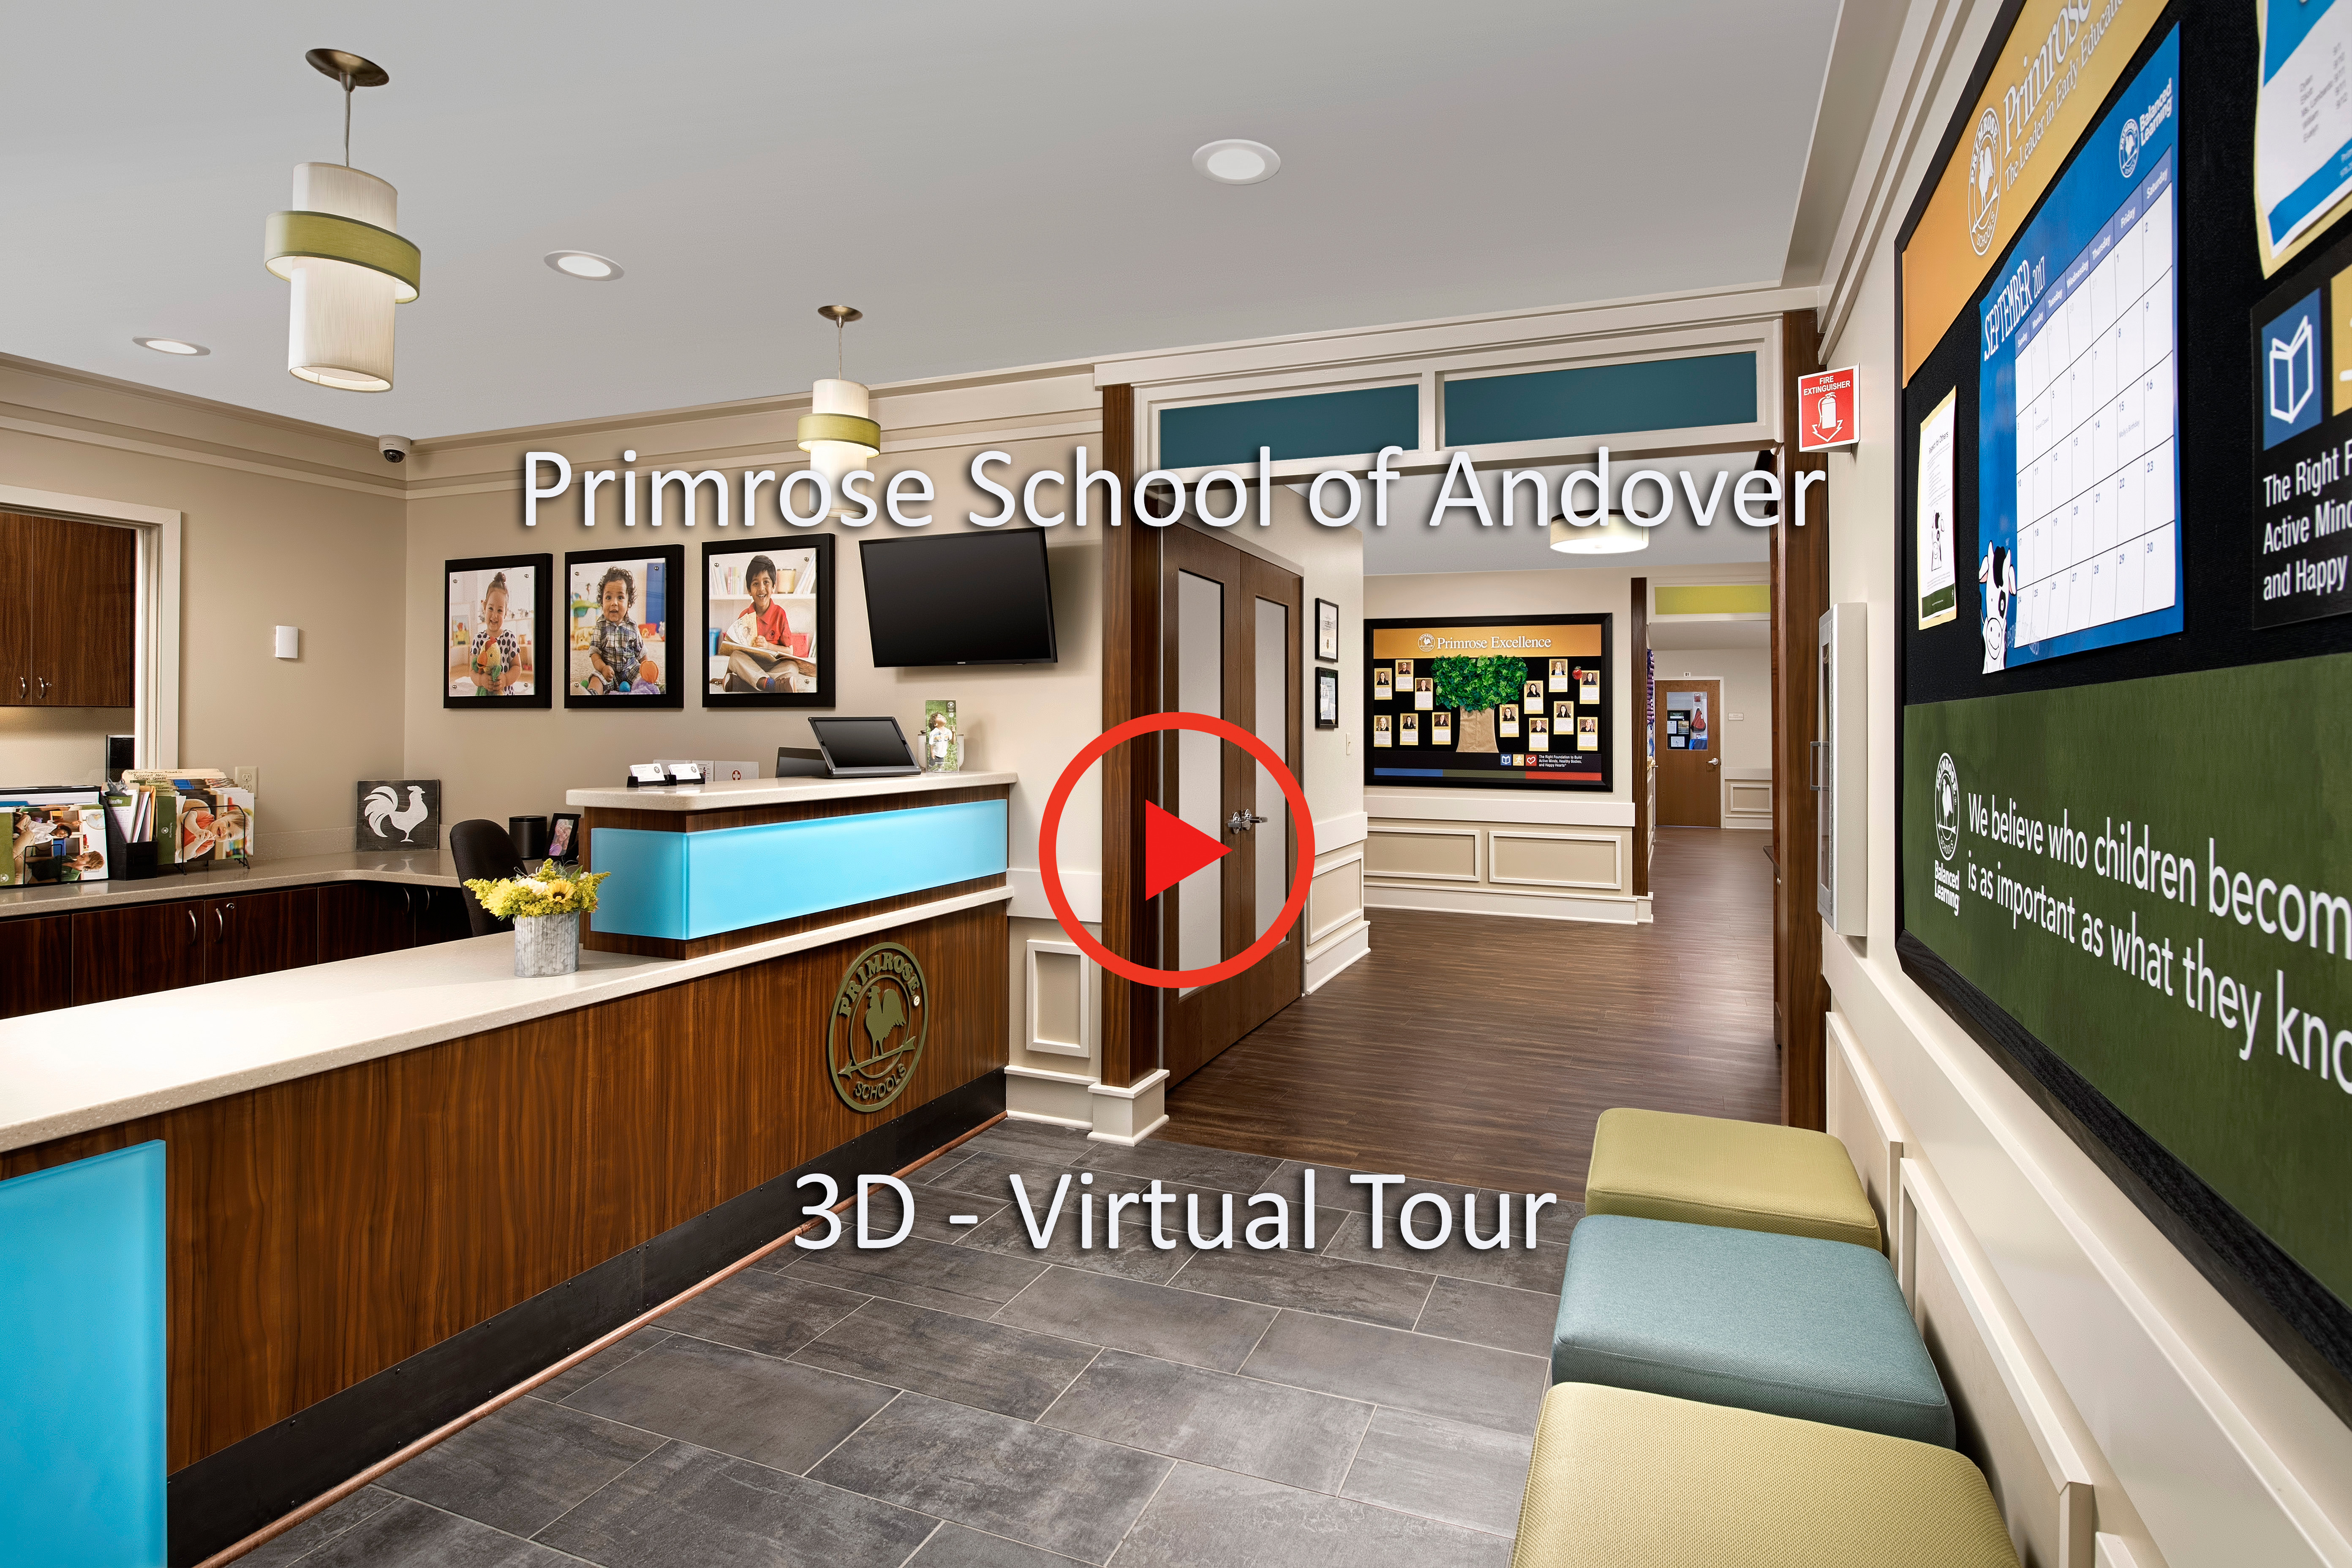 virtual tour of Primrose School of Andover